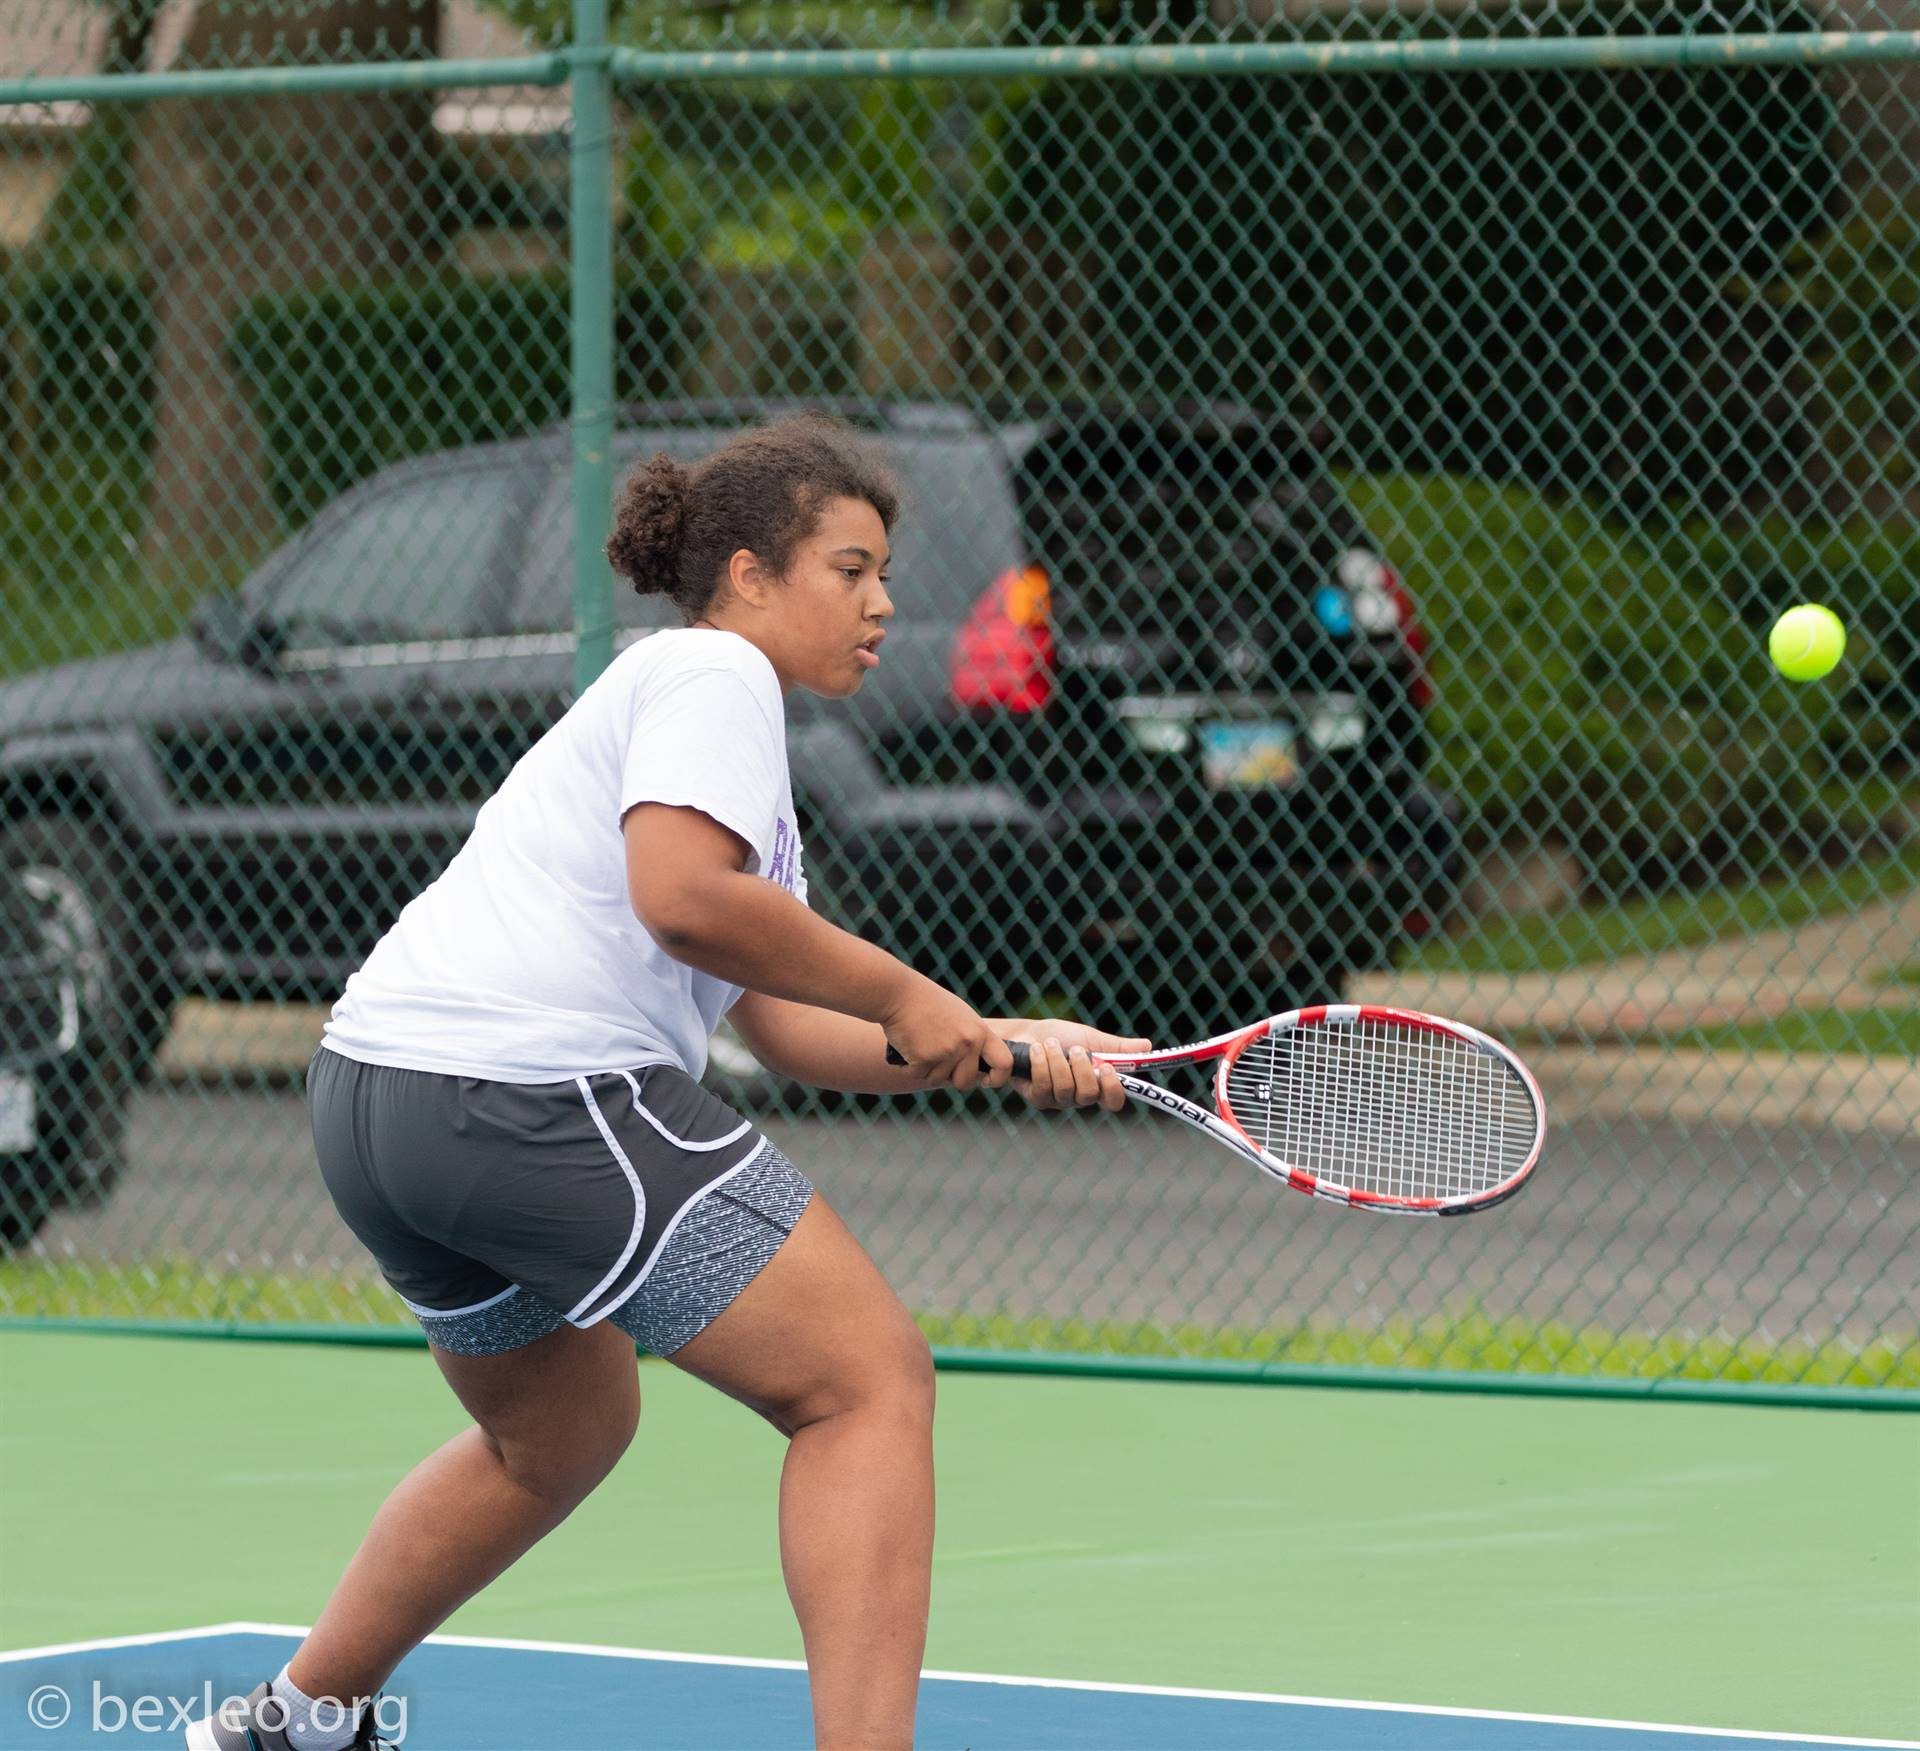 JV Tennis player hitting tennis ball